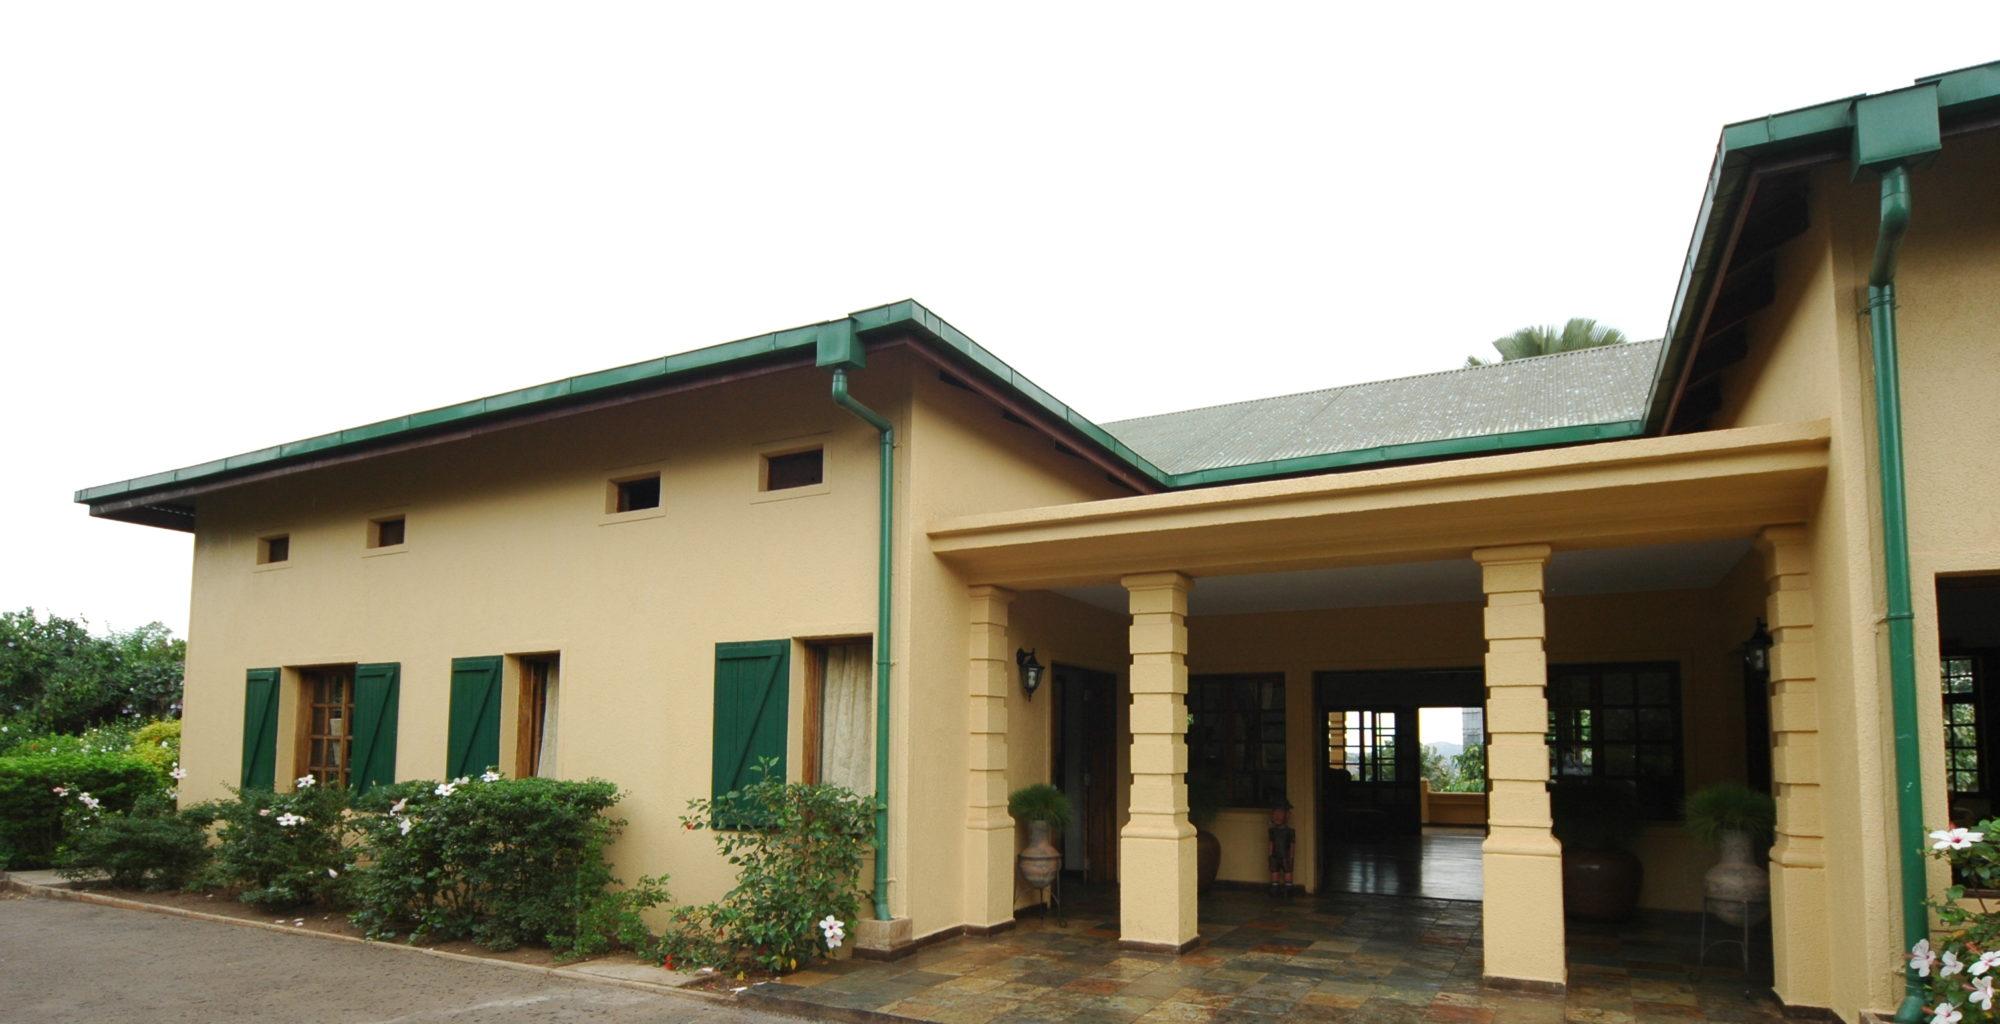 Emin Pasha Uganda Exterior